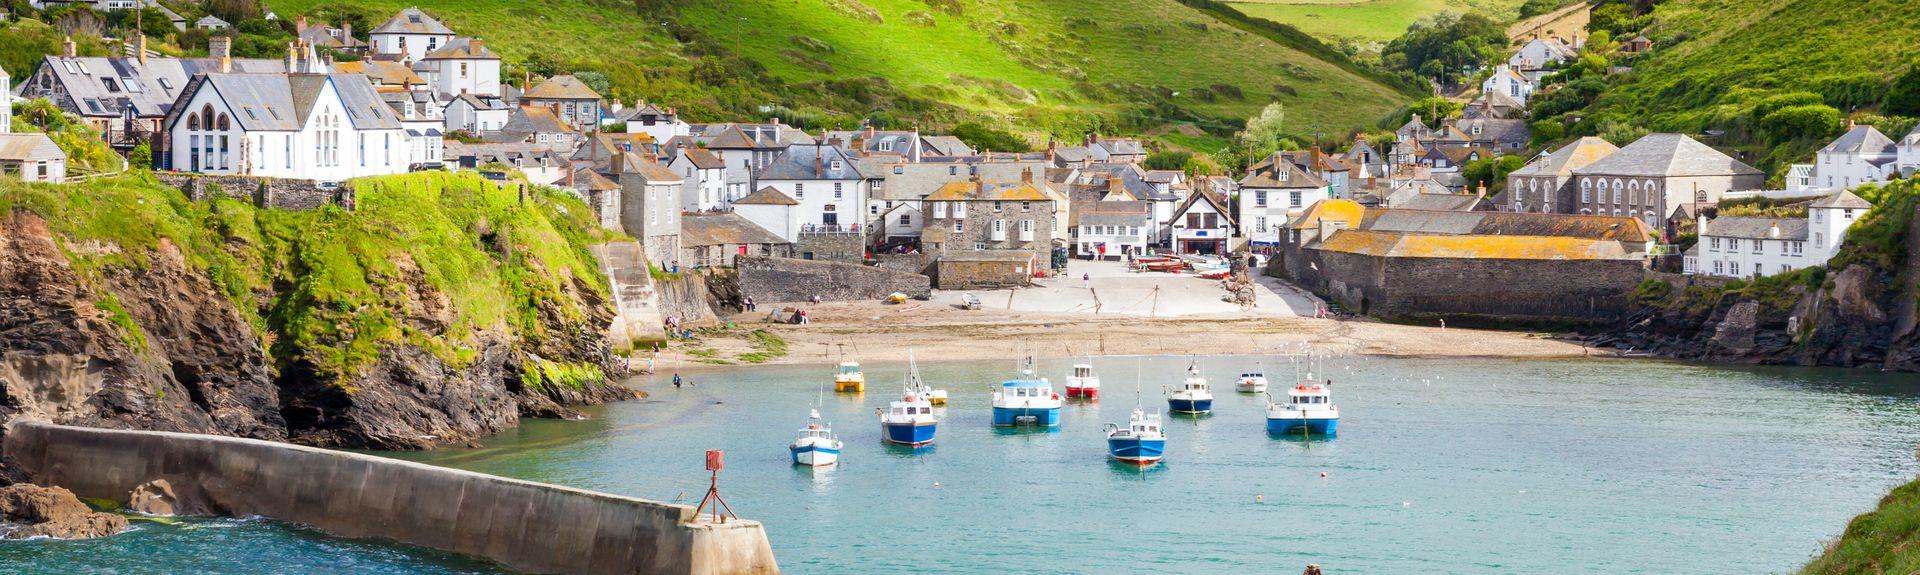 North Cornwall, Inglaterra, Reino Unido